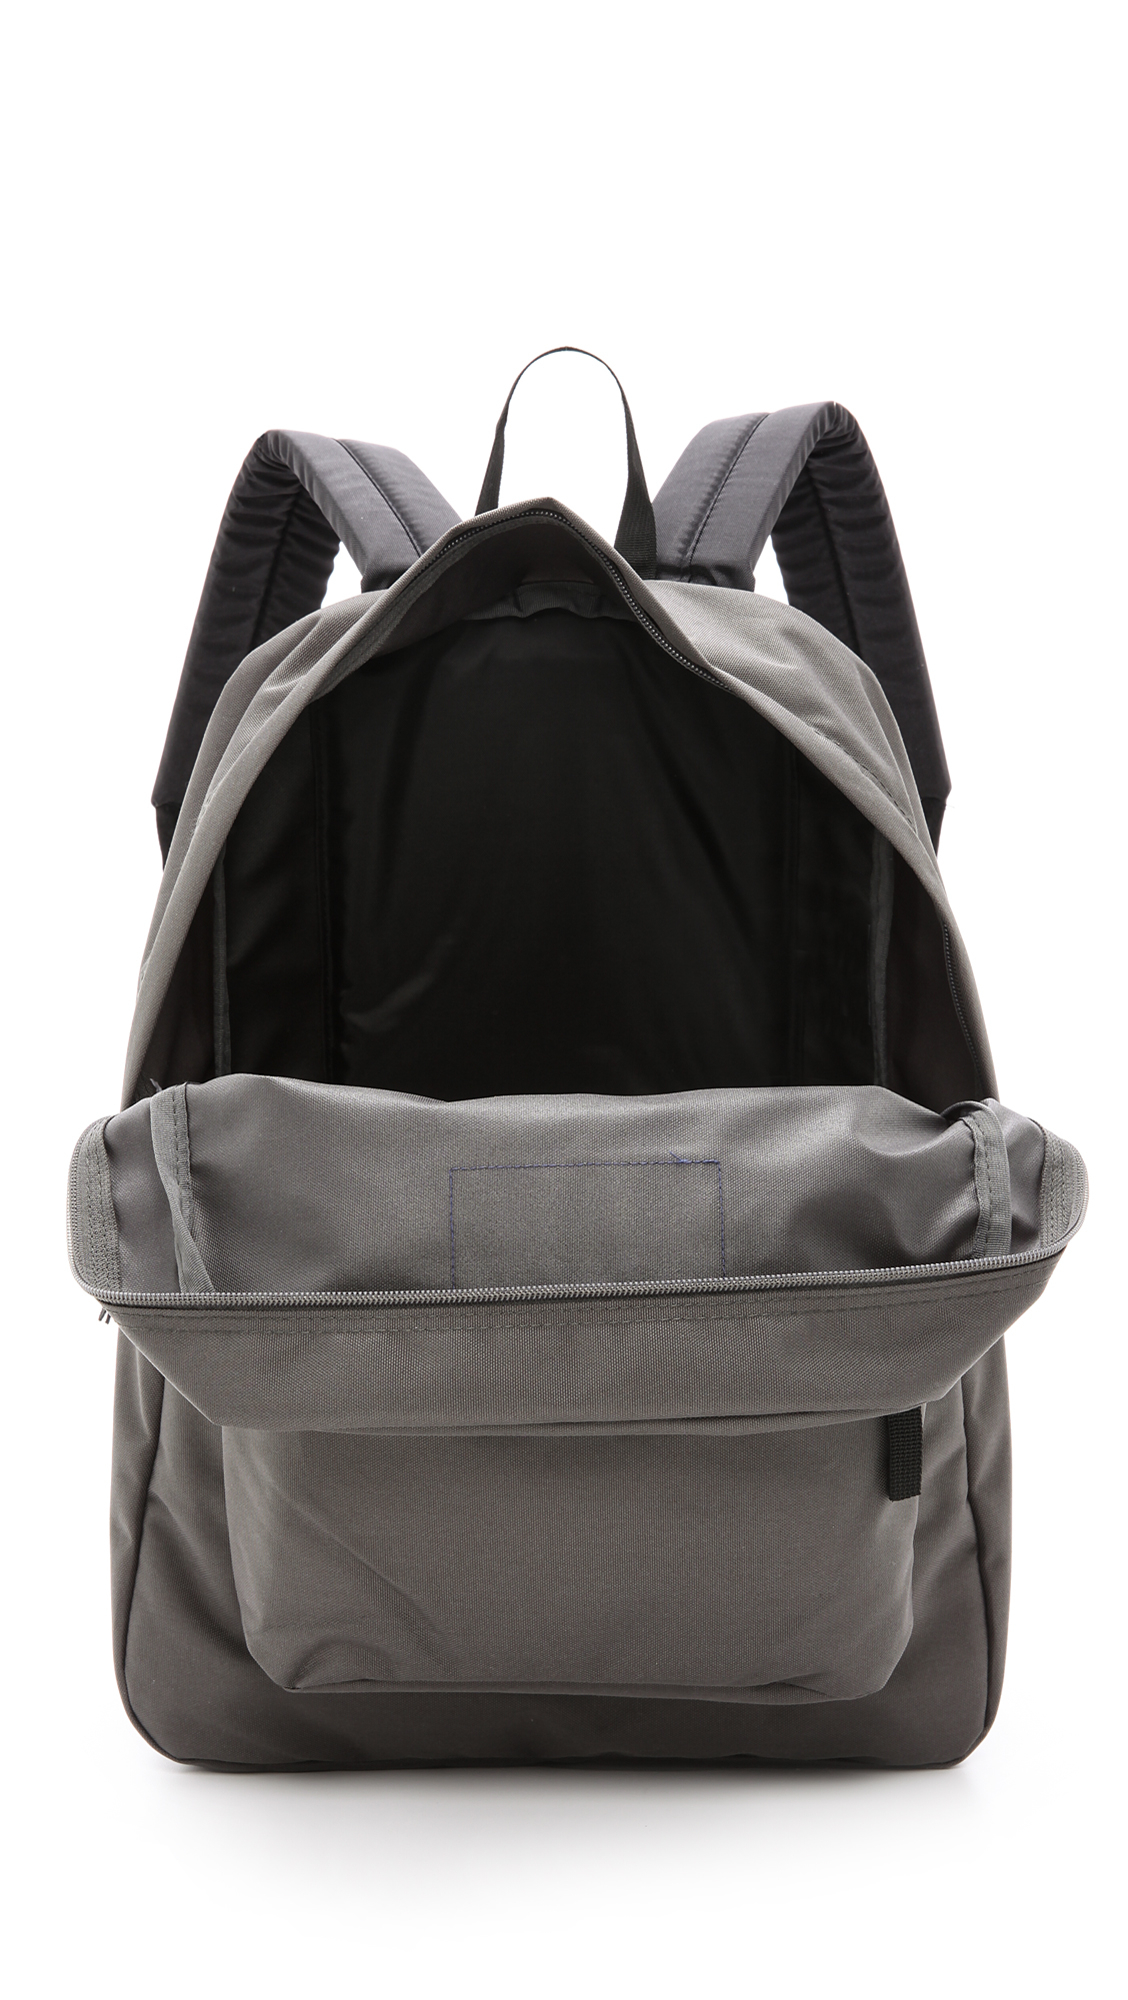 Lyst Jansport Superbreak Backpack In Gray For Men